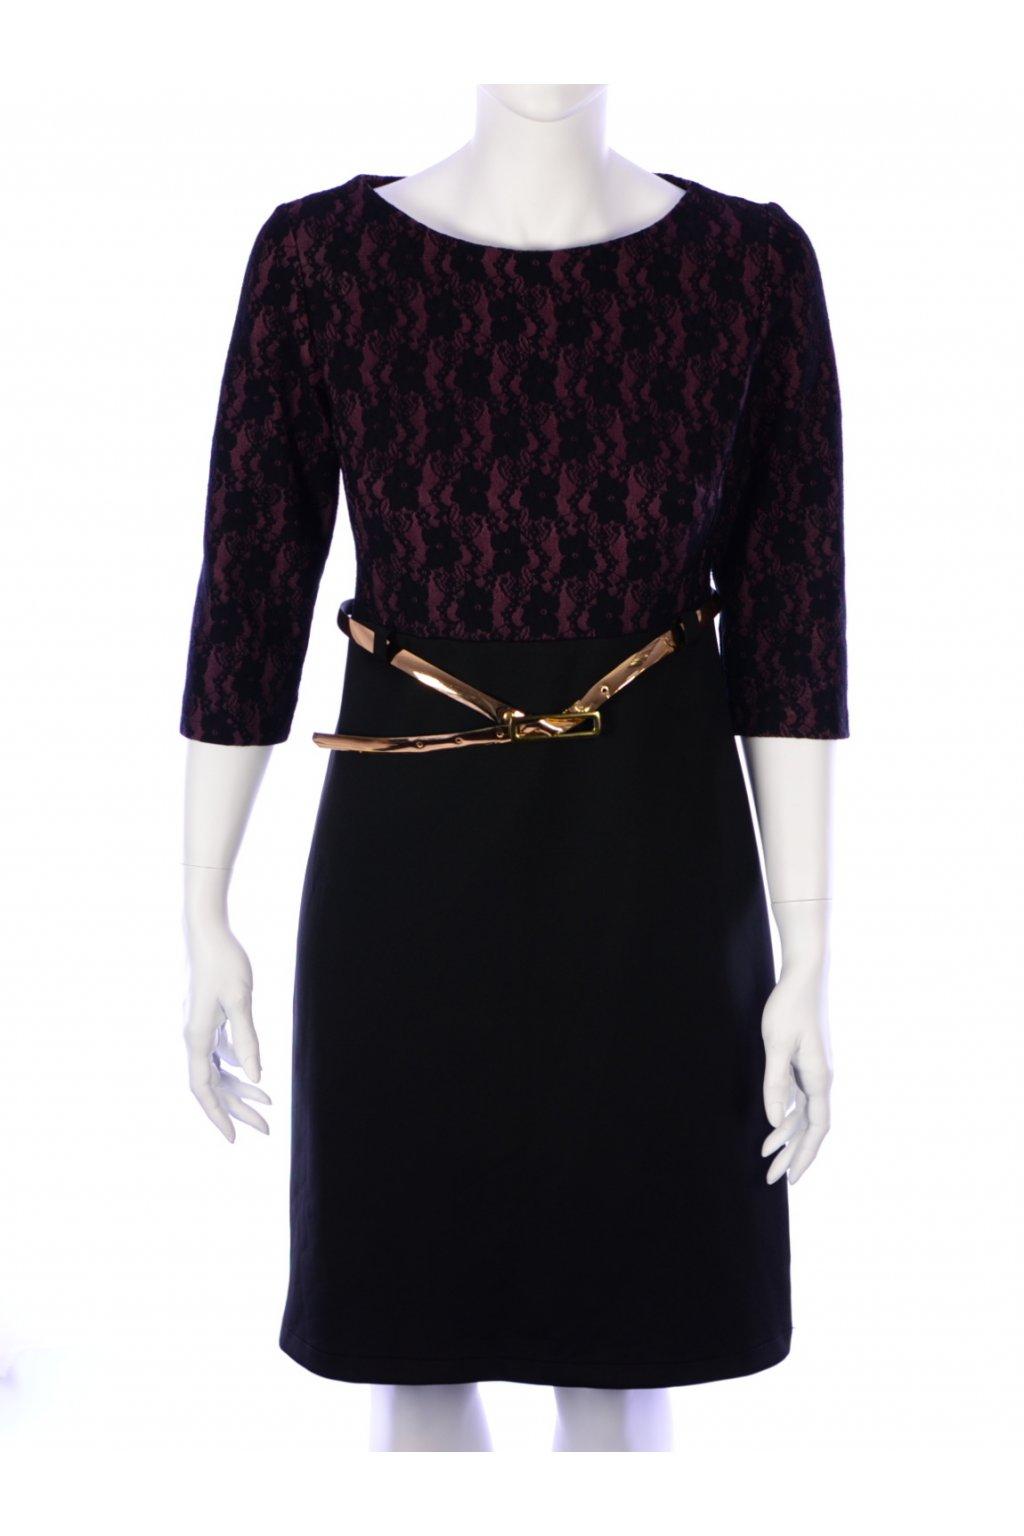 Šaty fialovo-černé s krajkou Adika vel. 40